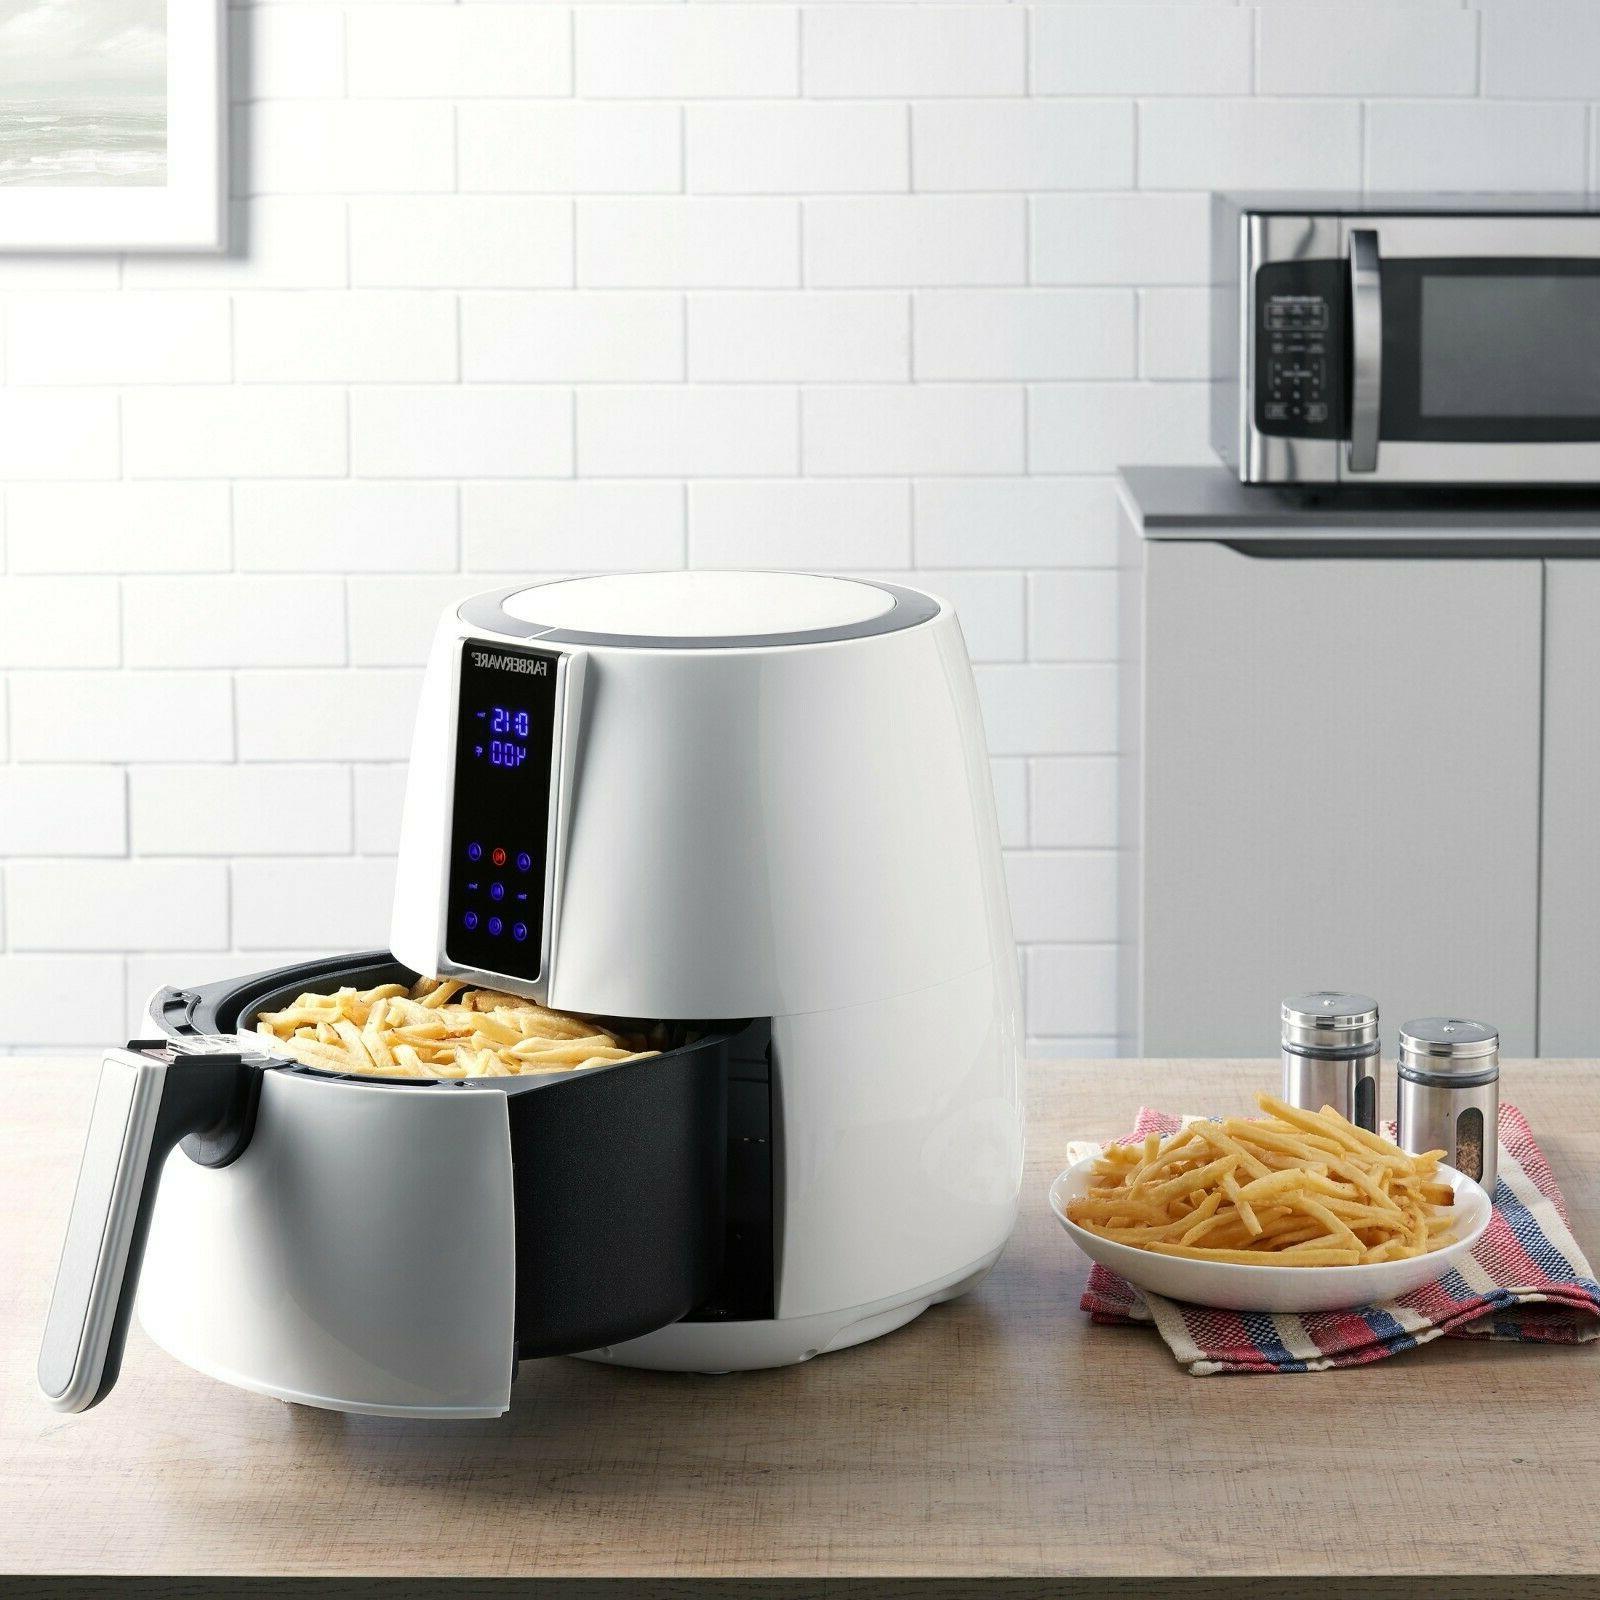 Farberware 3.2 Quart Digital Air Fryer, Oil-Less, White